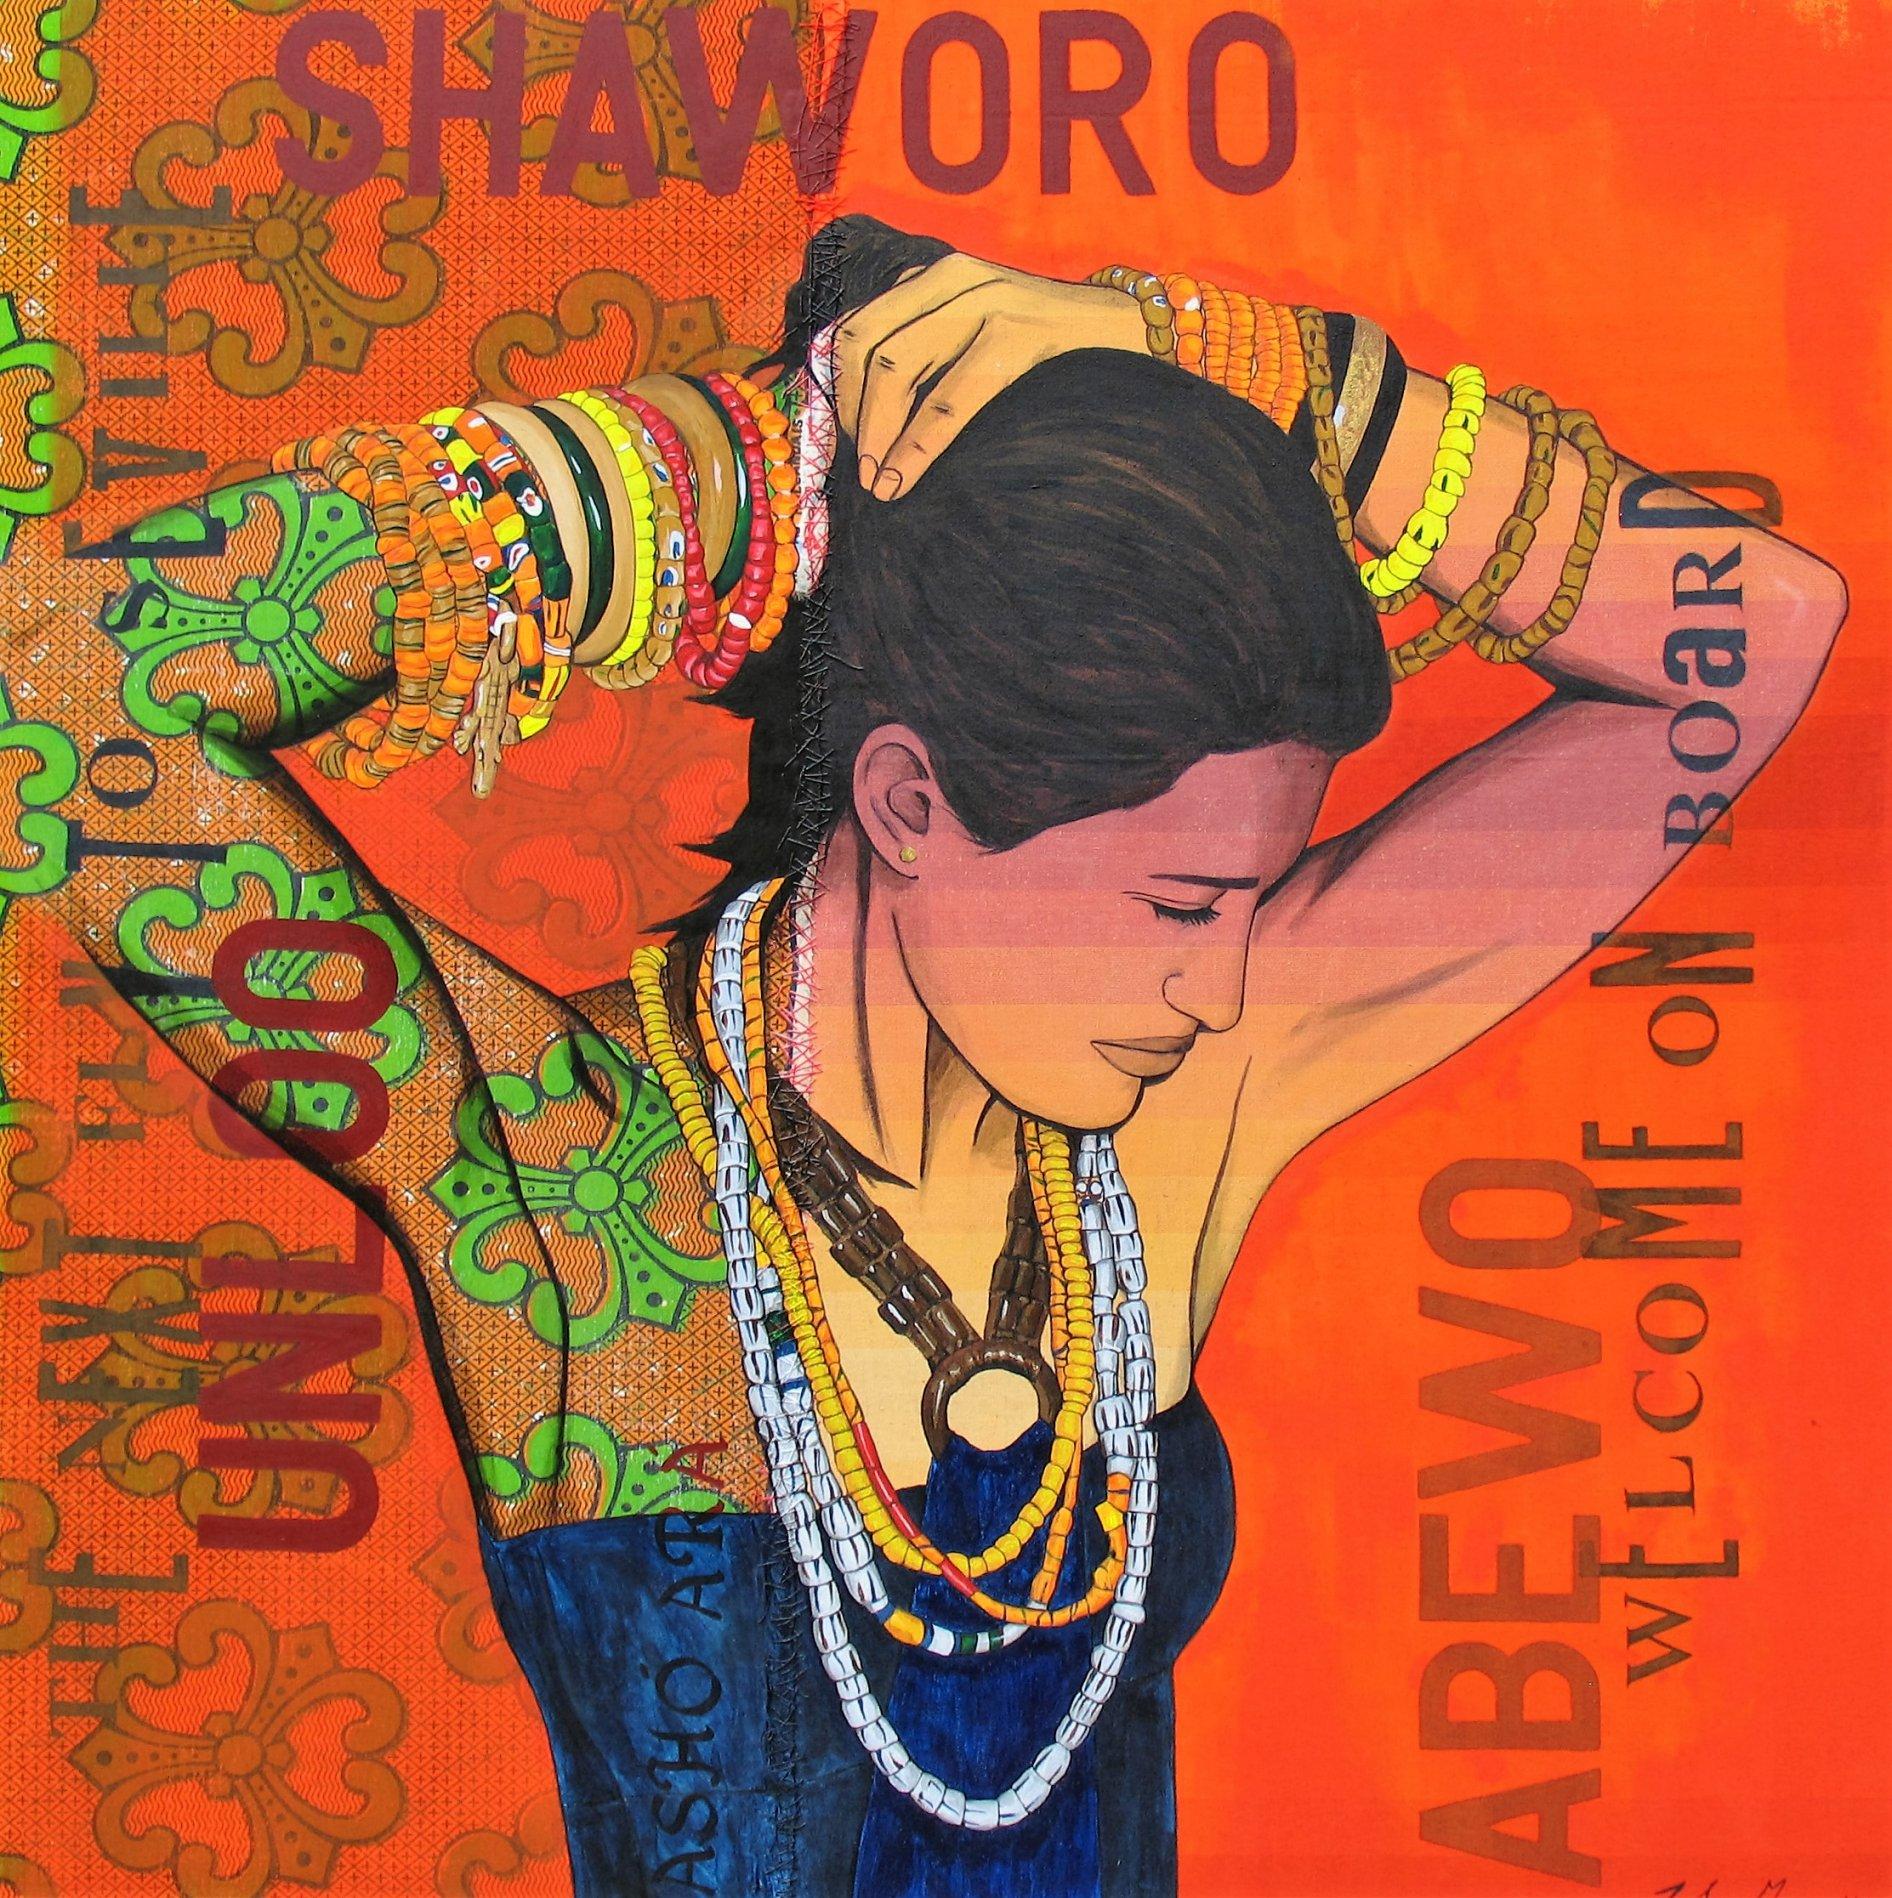 SHAWORO (2012) - Julia Marqués Meyer